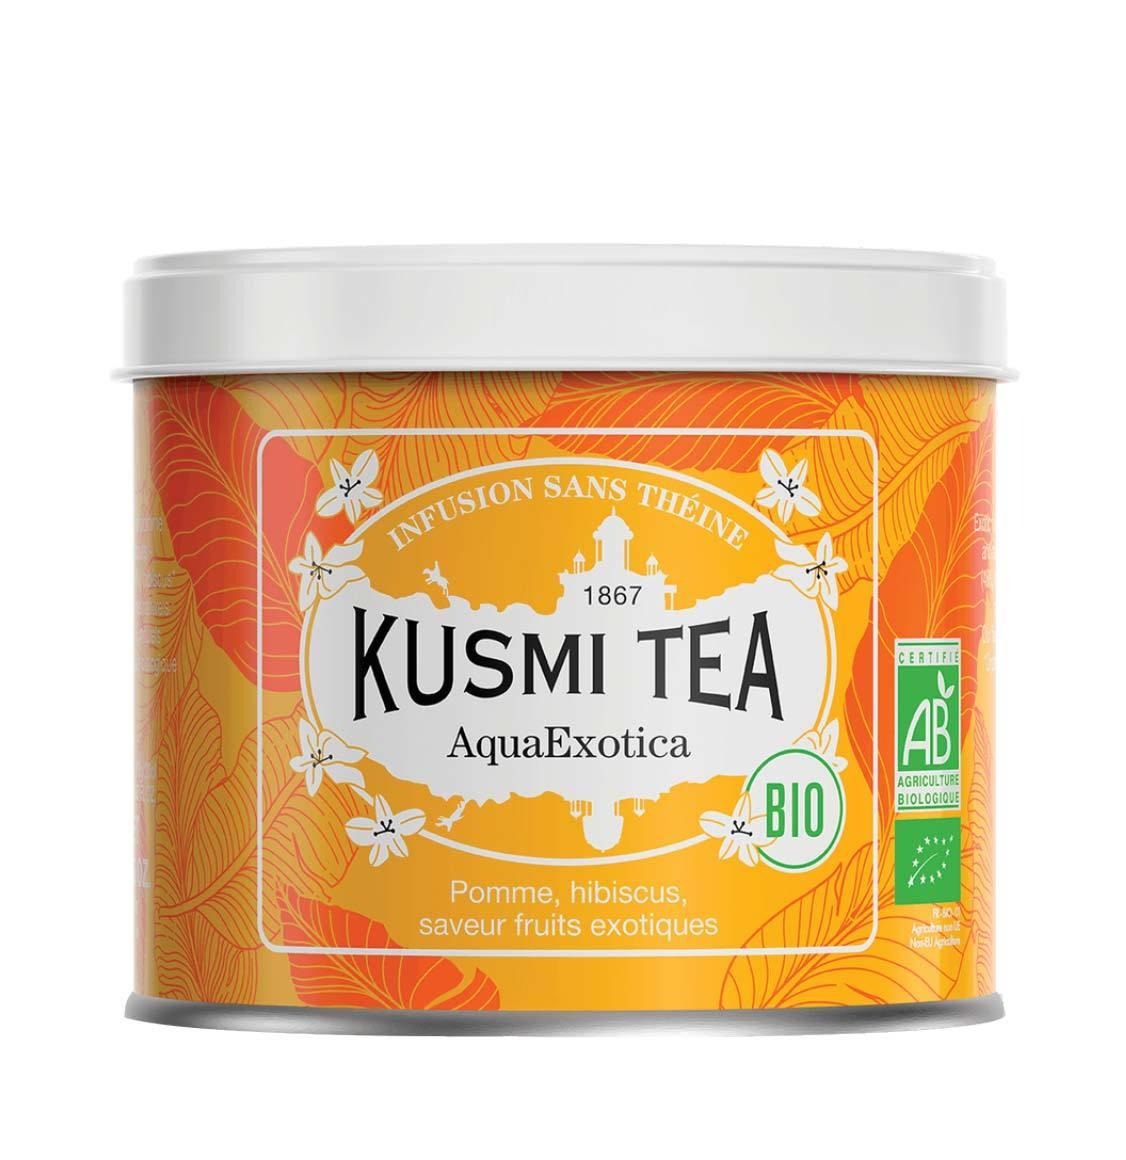 Kusmi Organic Aqua Exotica Loose Tea 100g